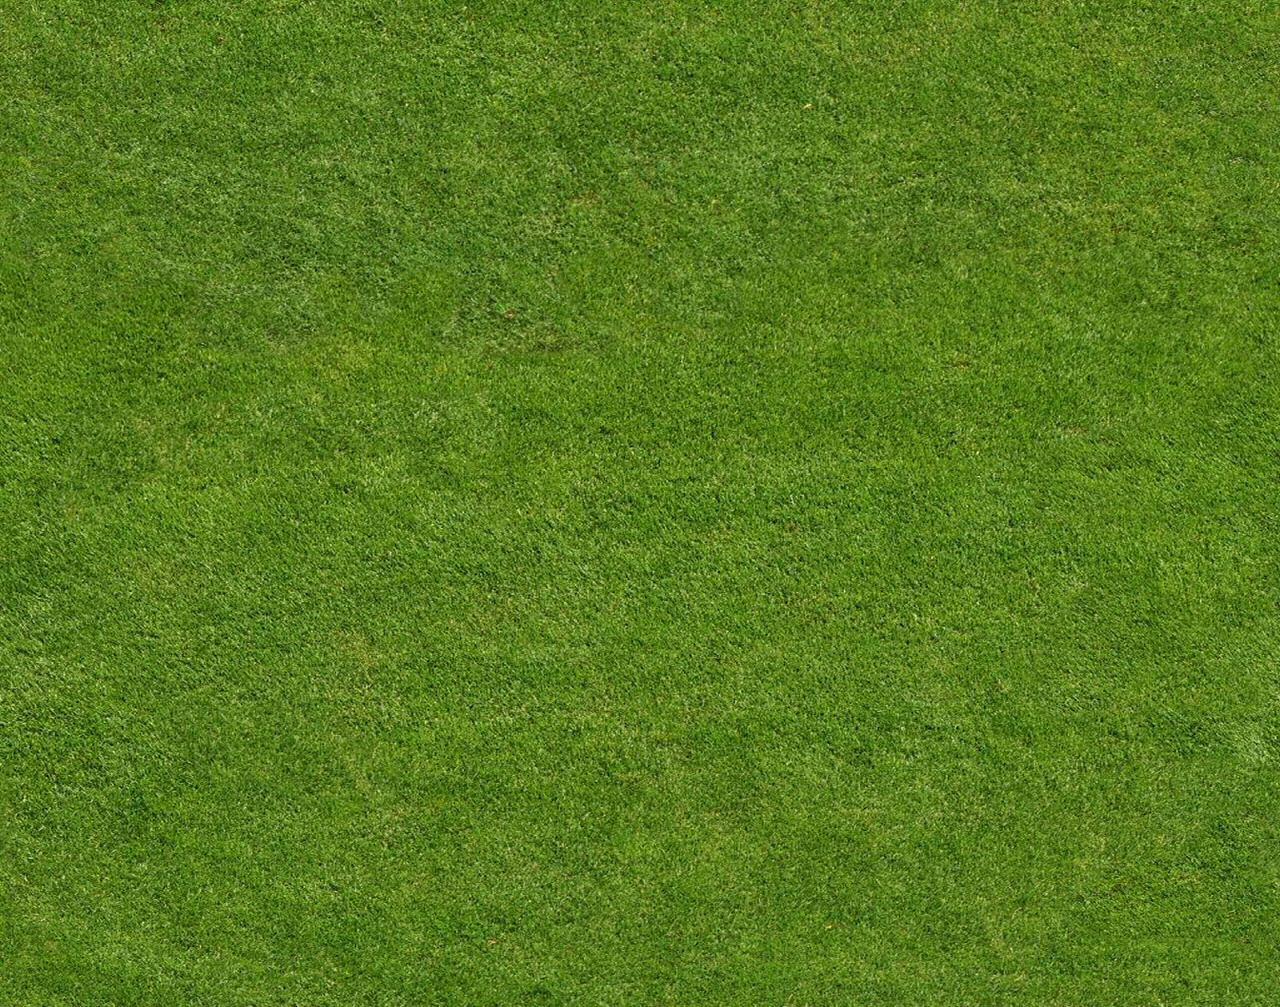 Green Field Sports Art PPT Backgrounds